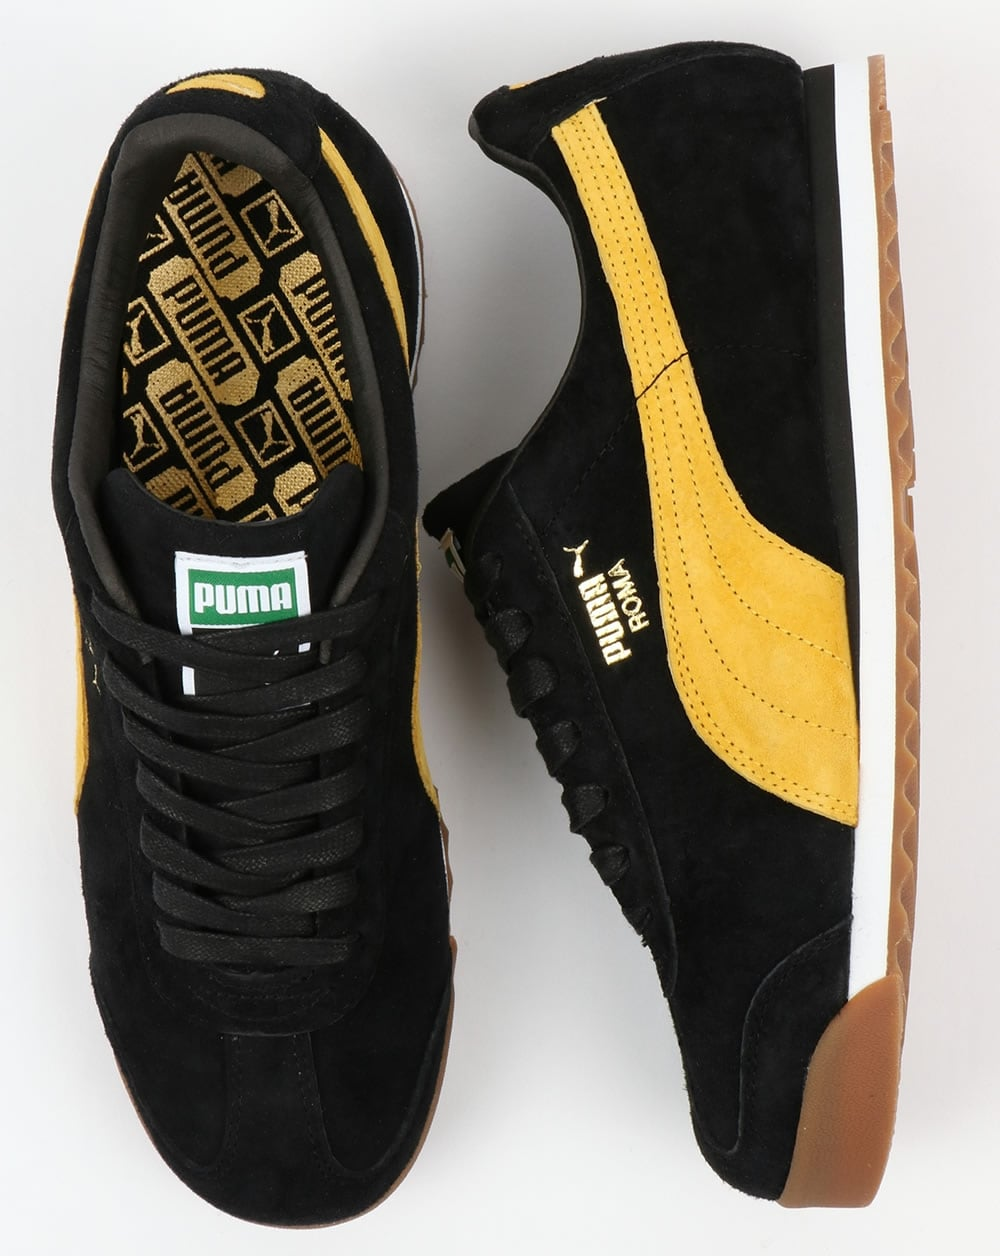 e53eaa10 Puma Roma Trainers Black/Yellow